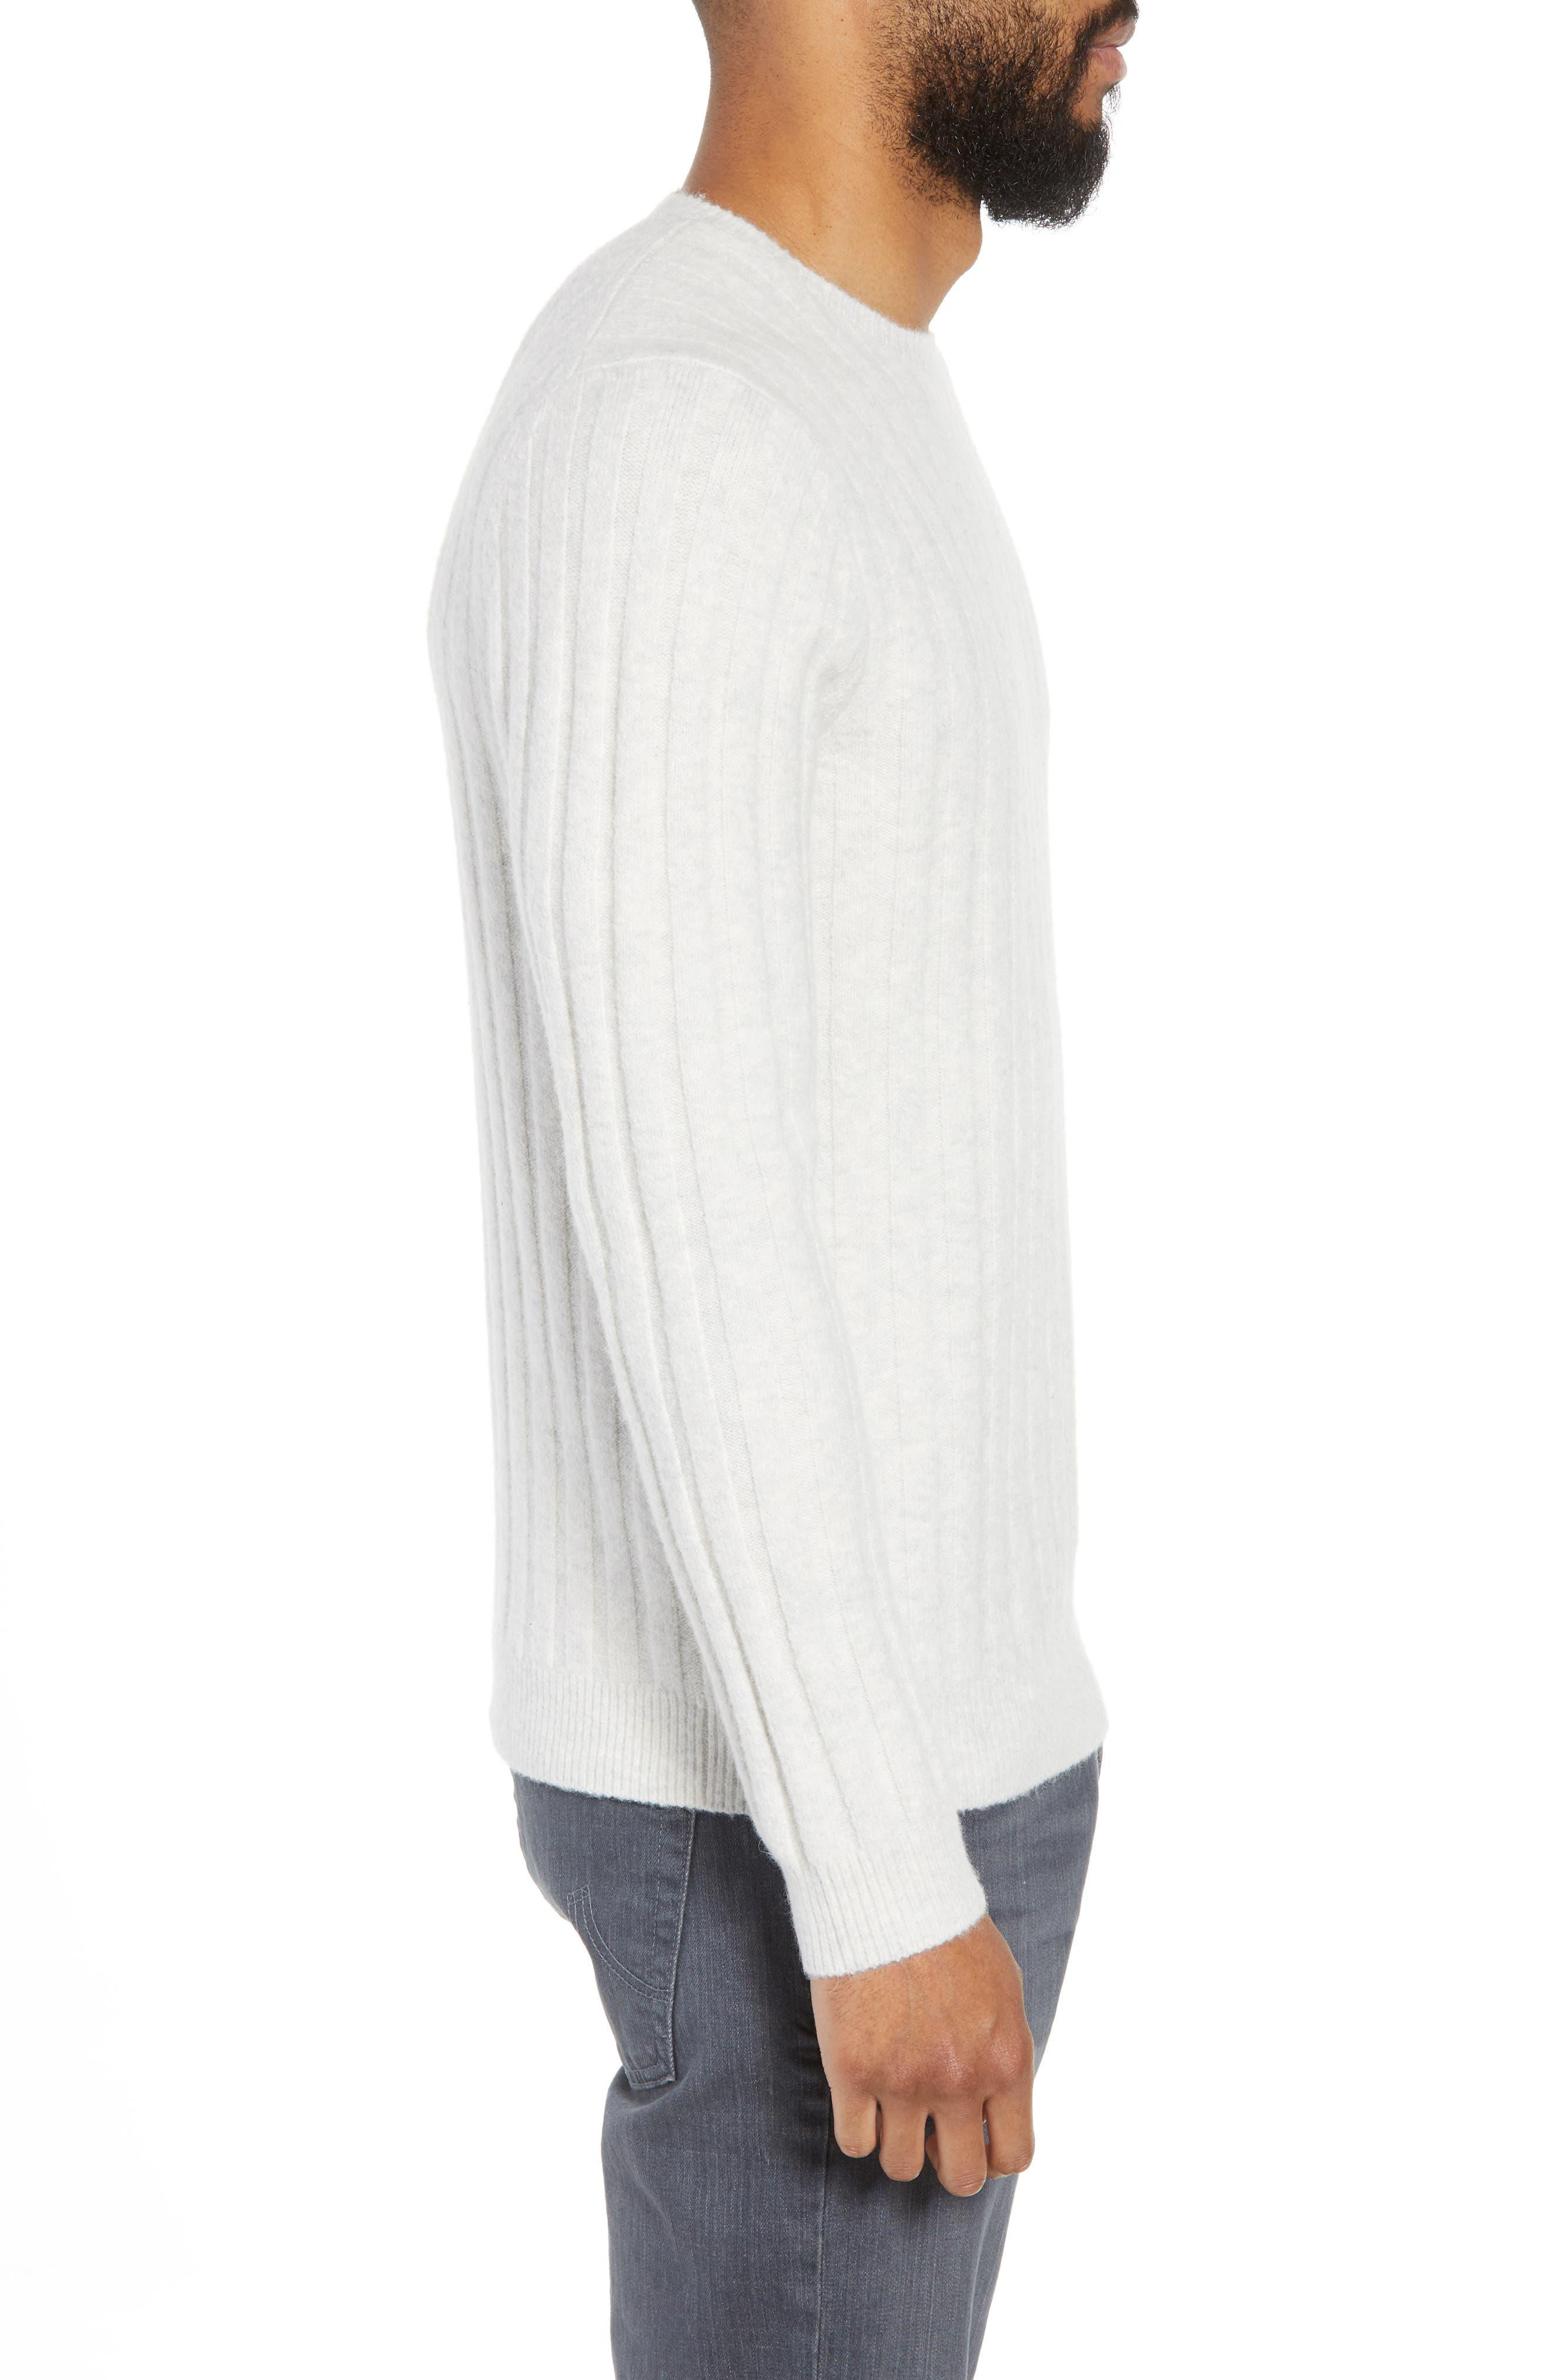 Rib Crewneck Sweater,                             Alternate thumbnail 3, color,                             GREY SILK HEATHER